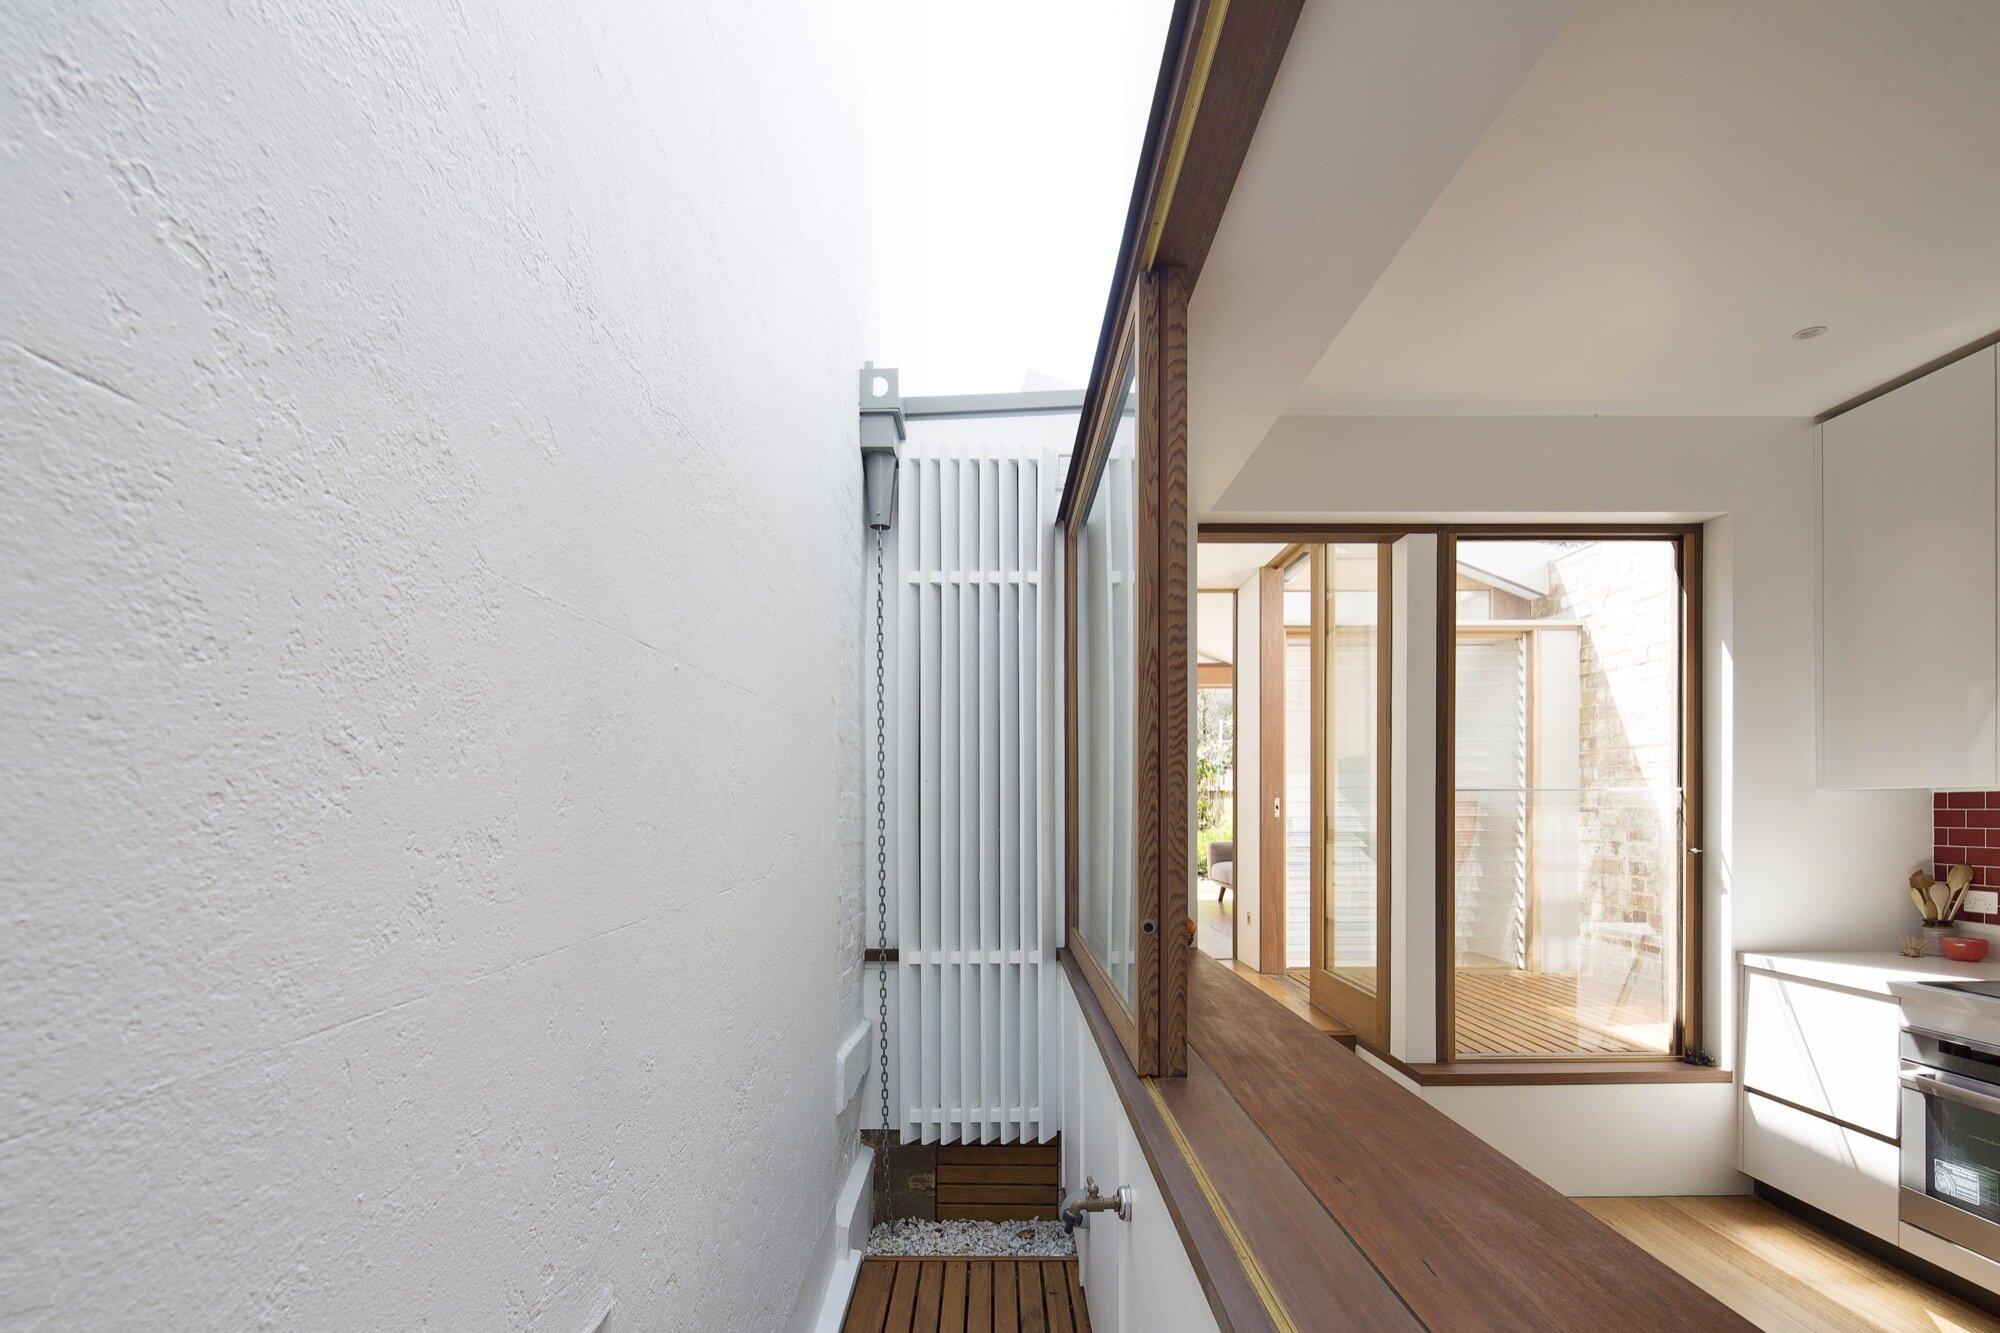 Petersham Courtyard House - Adriano Pupilli - Australia - Corridor - Humble Homes